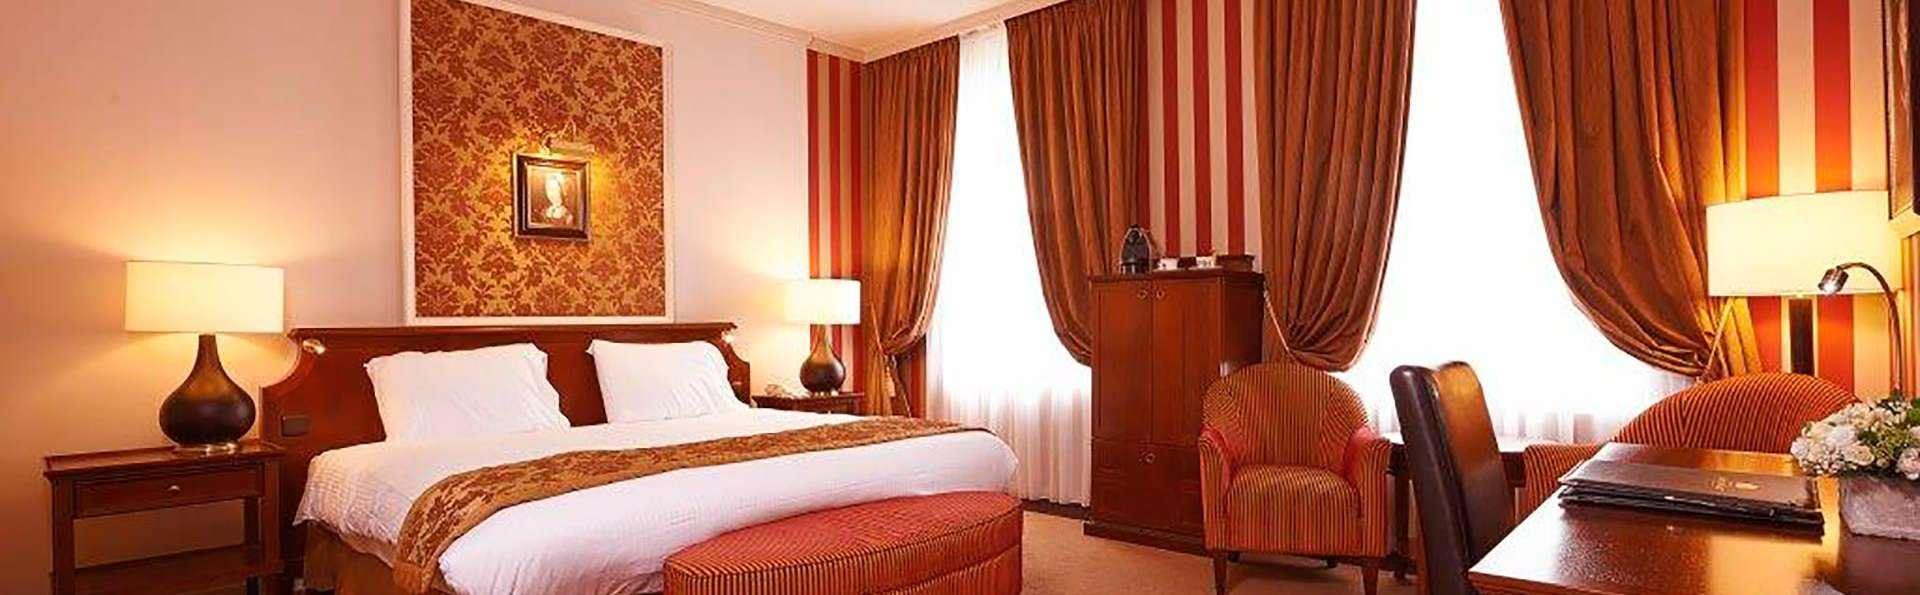 Hotel Dukes' Palace - EDIT_deluxe1.jpg